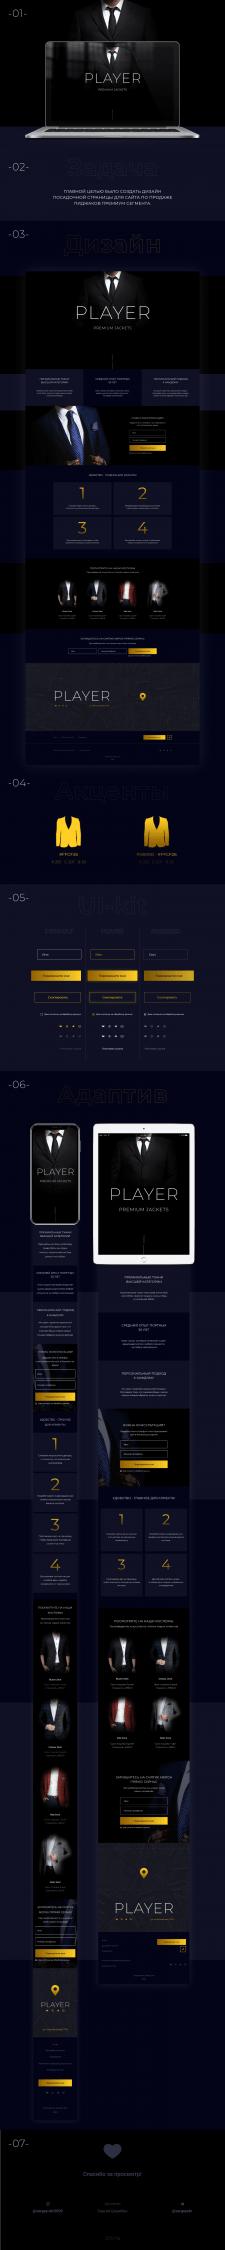 Premium Jackets - Landing Page